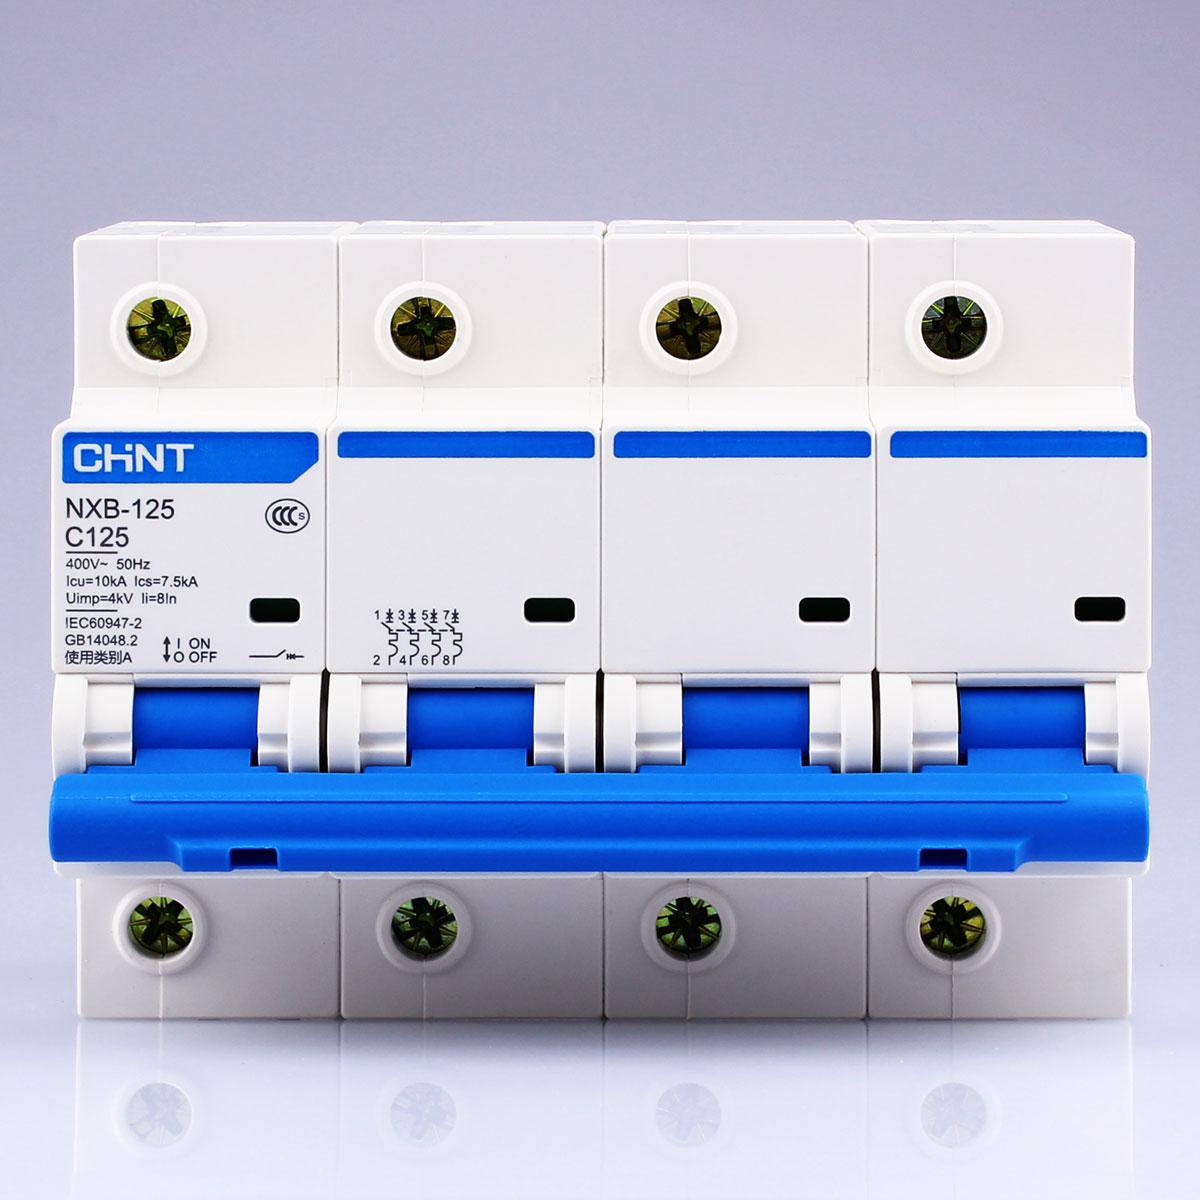 CHNT CHINT NXB-125 4P 63A 80A 100A 125A 230V Miniature Circuit breaker MCB NEW DZ47 блуза mango блуза